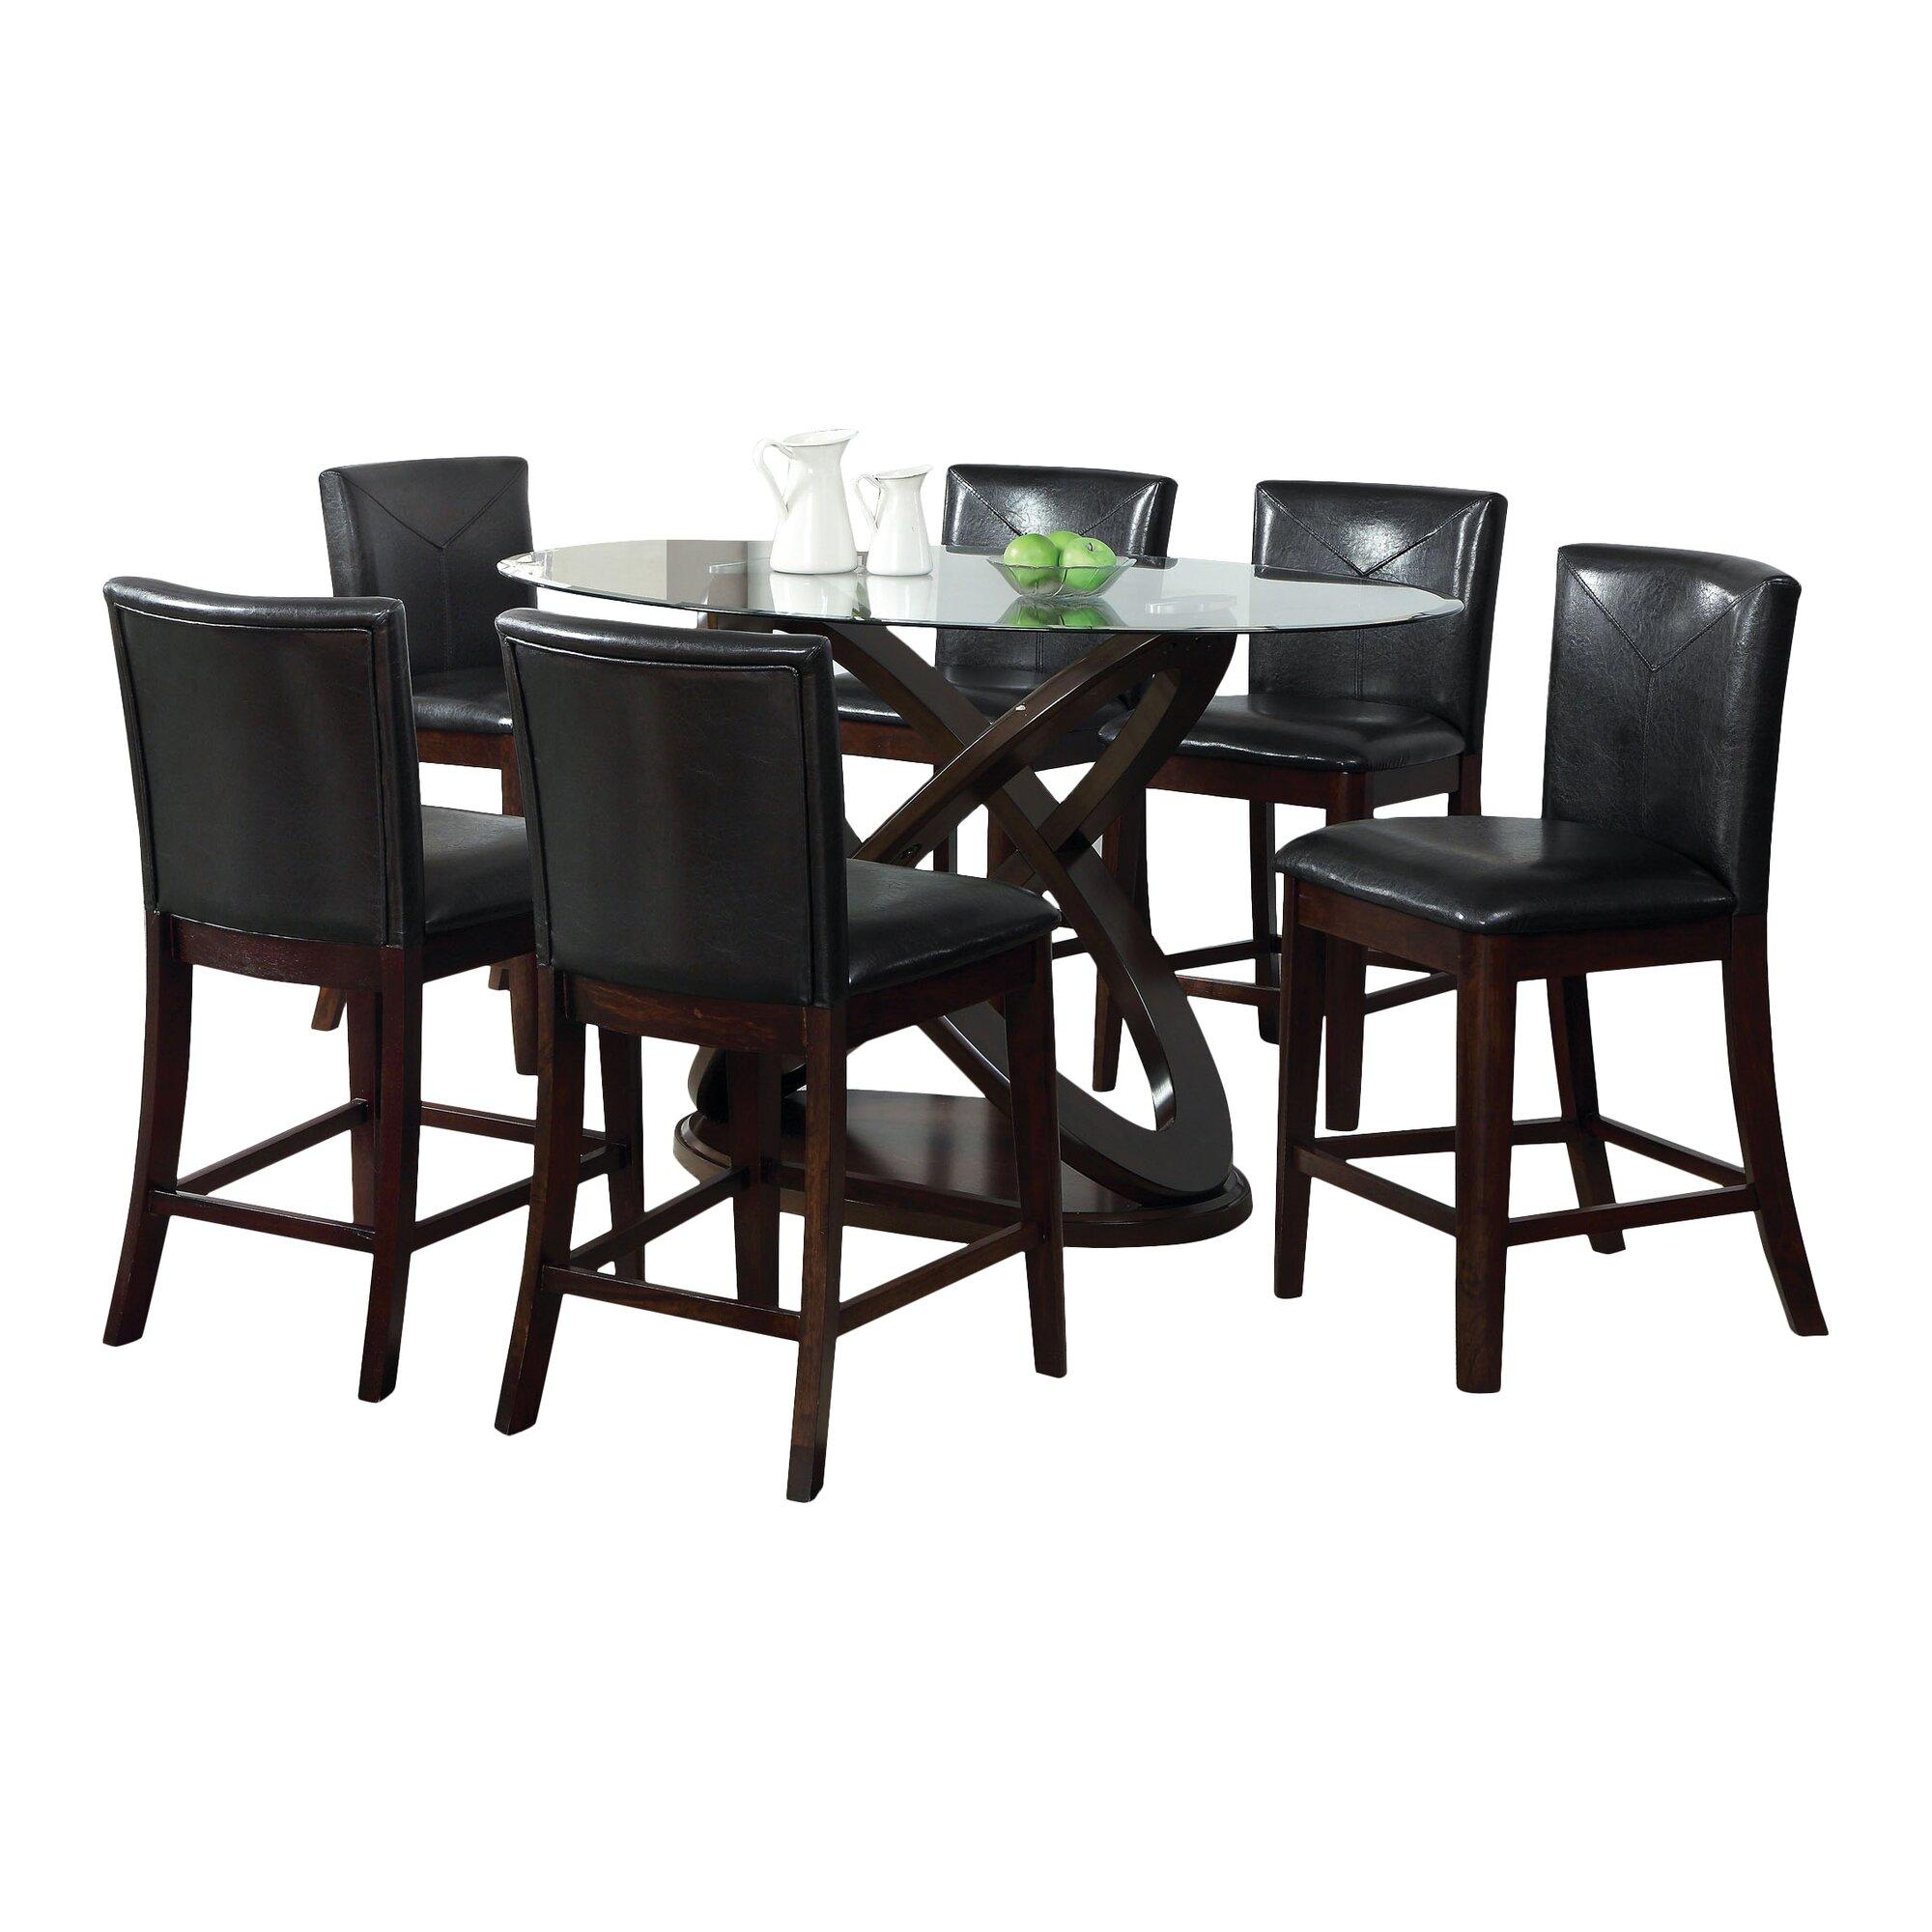 Hokku Designs Ollivander 7 Piece Counter Height Dining Set ...